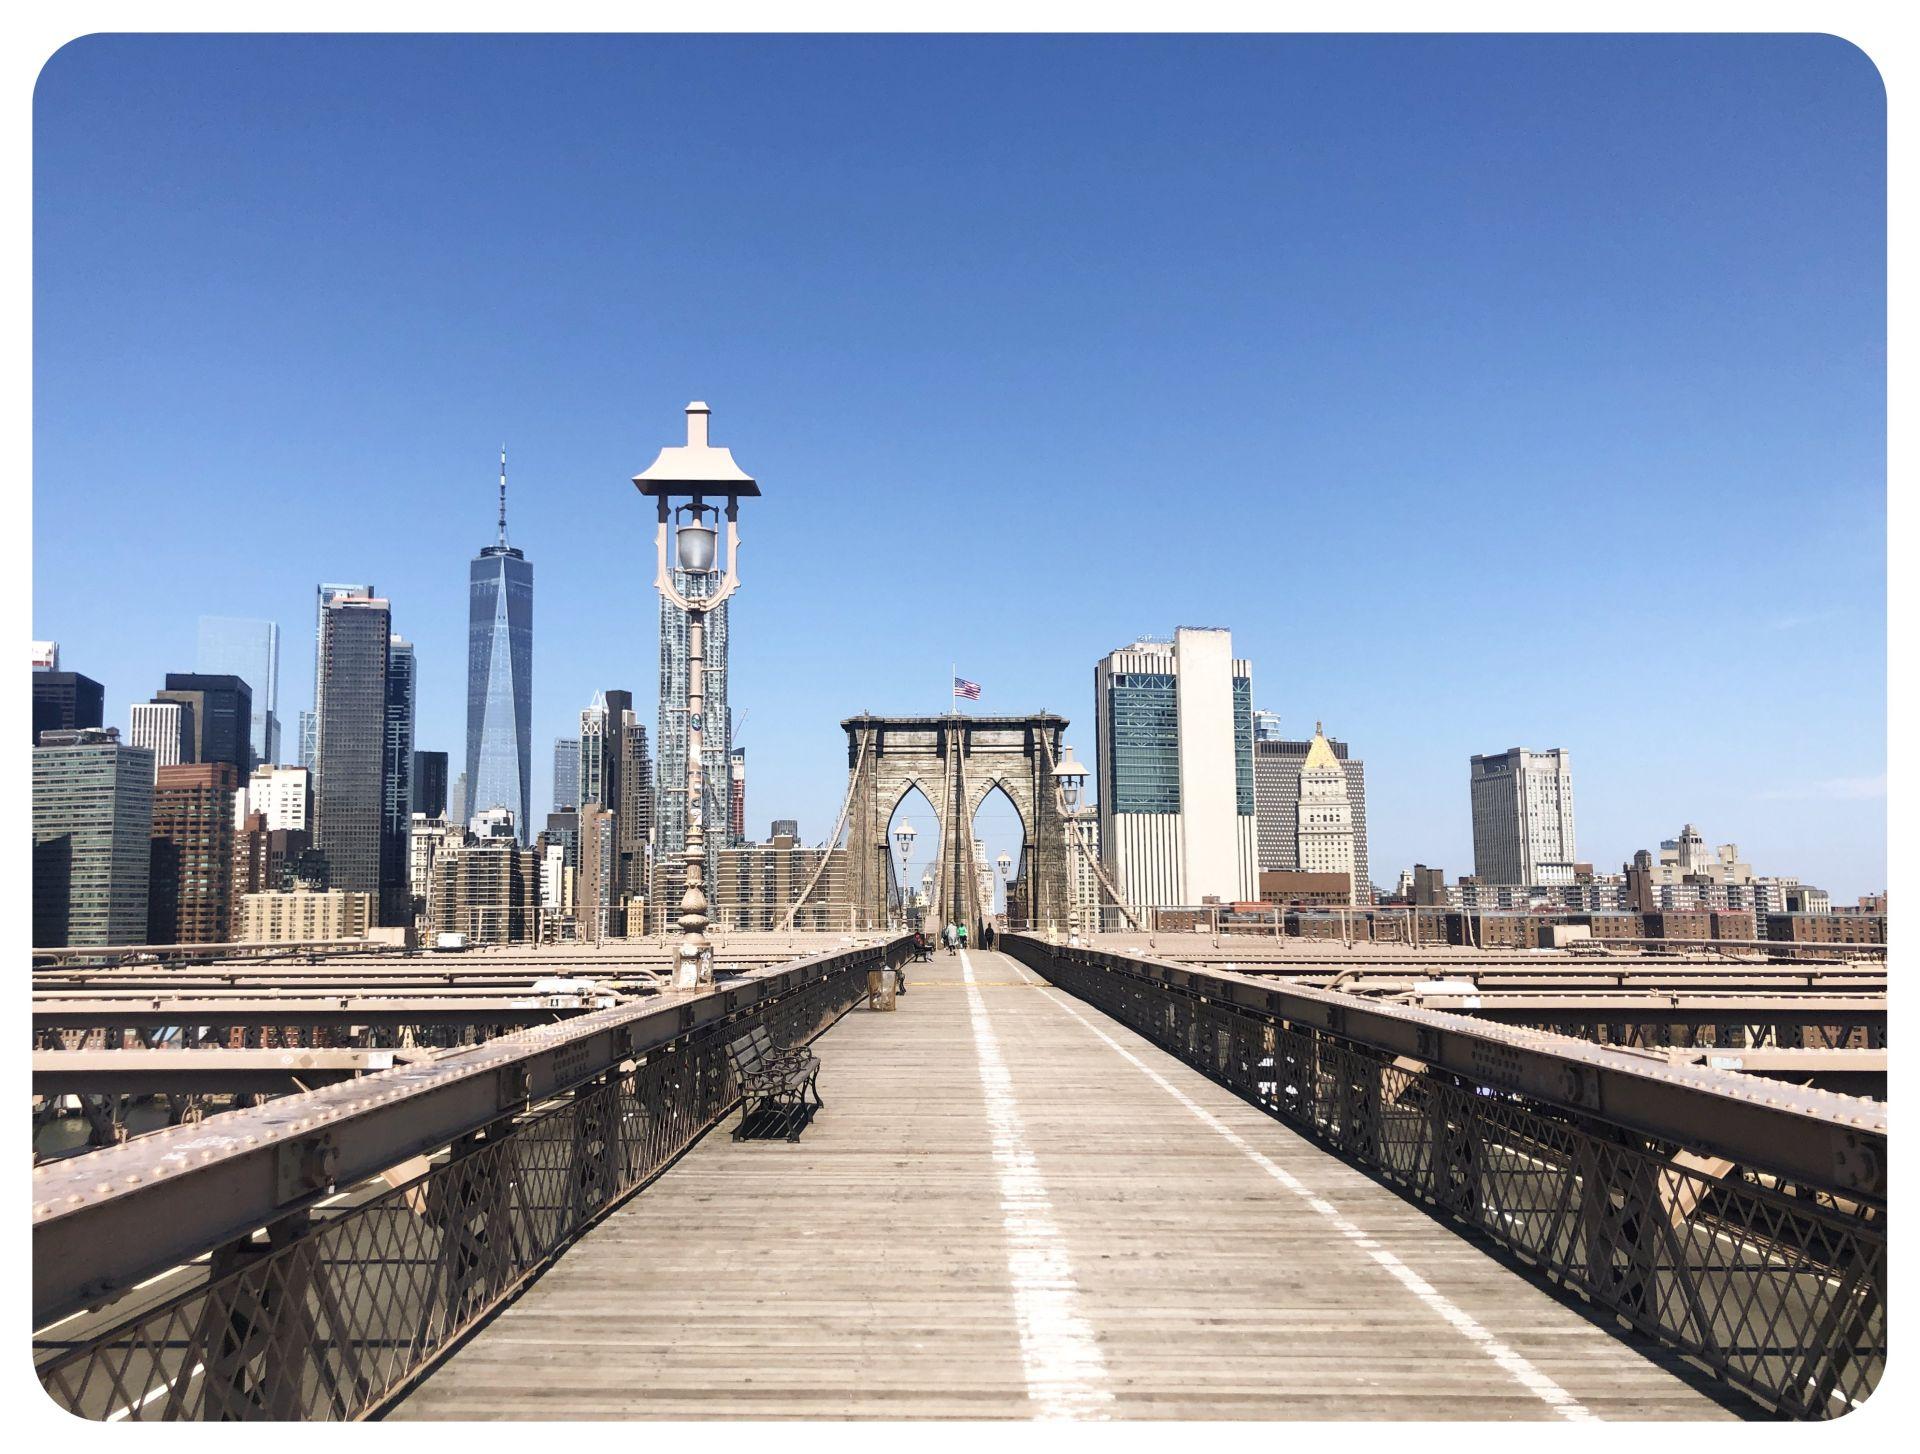 deserted brooklyn bridge